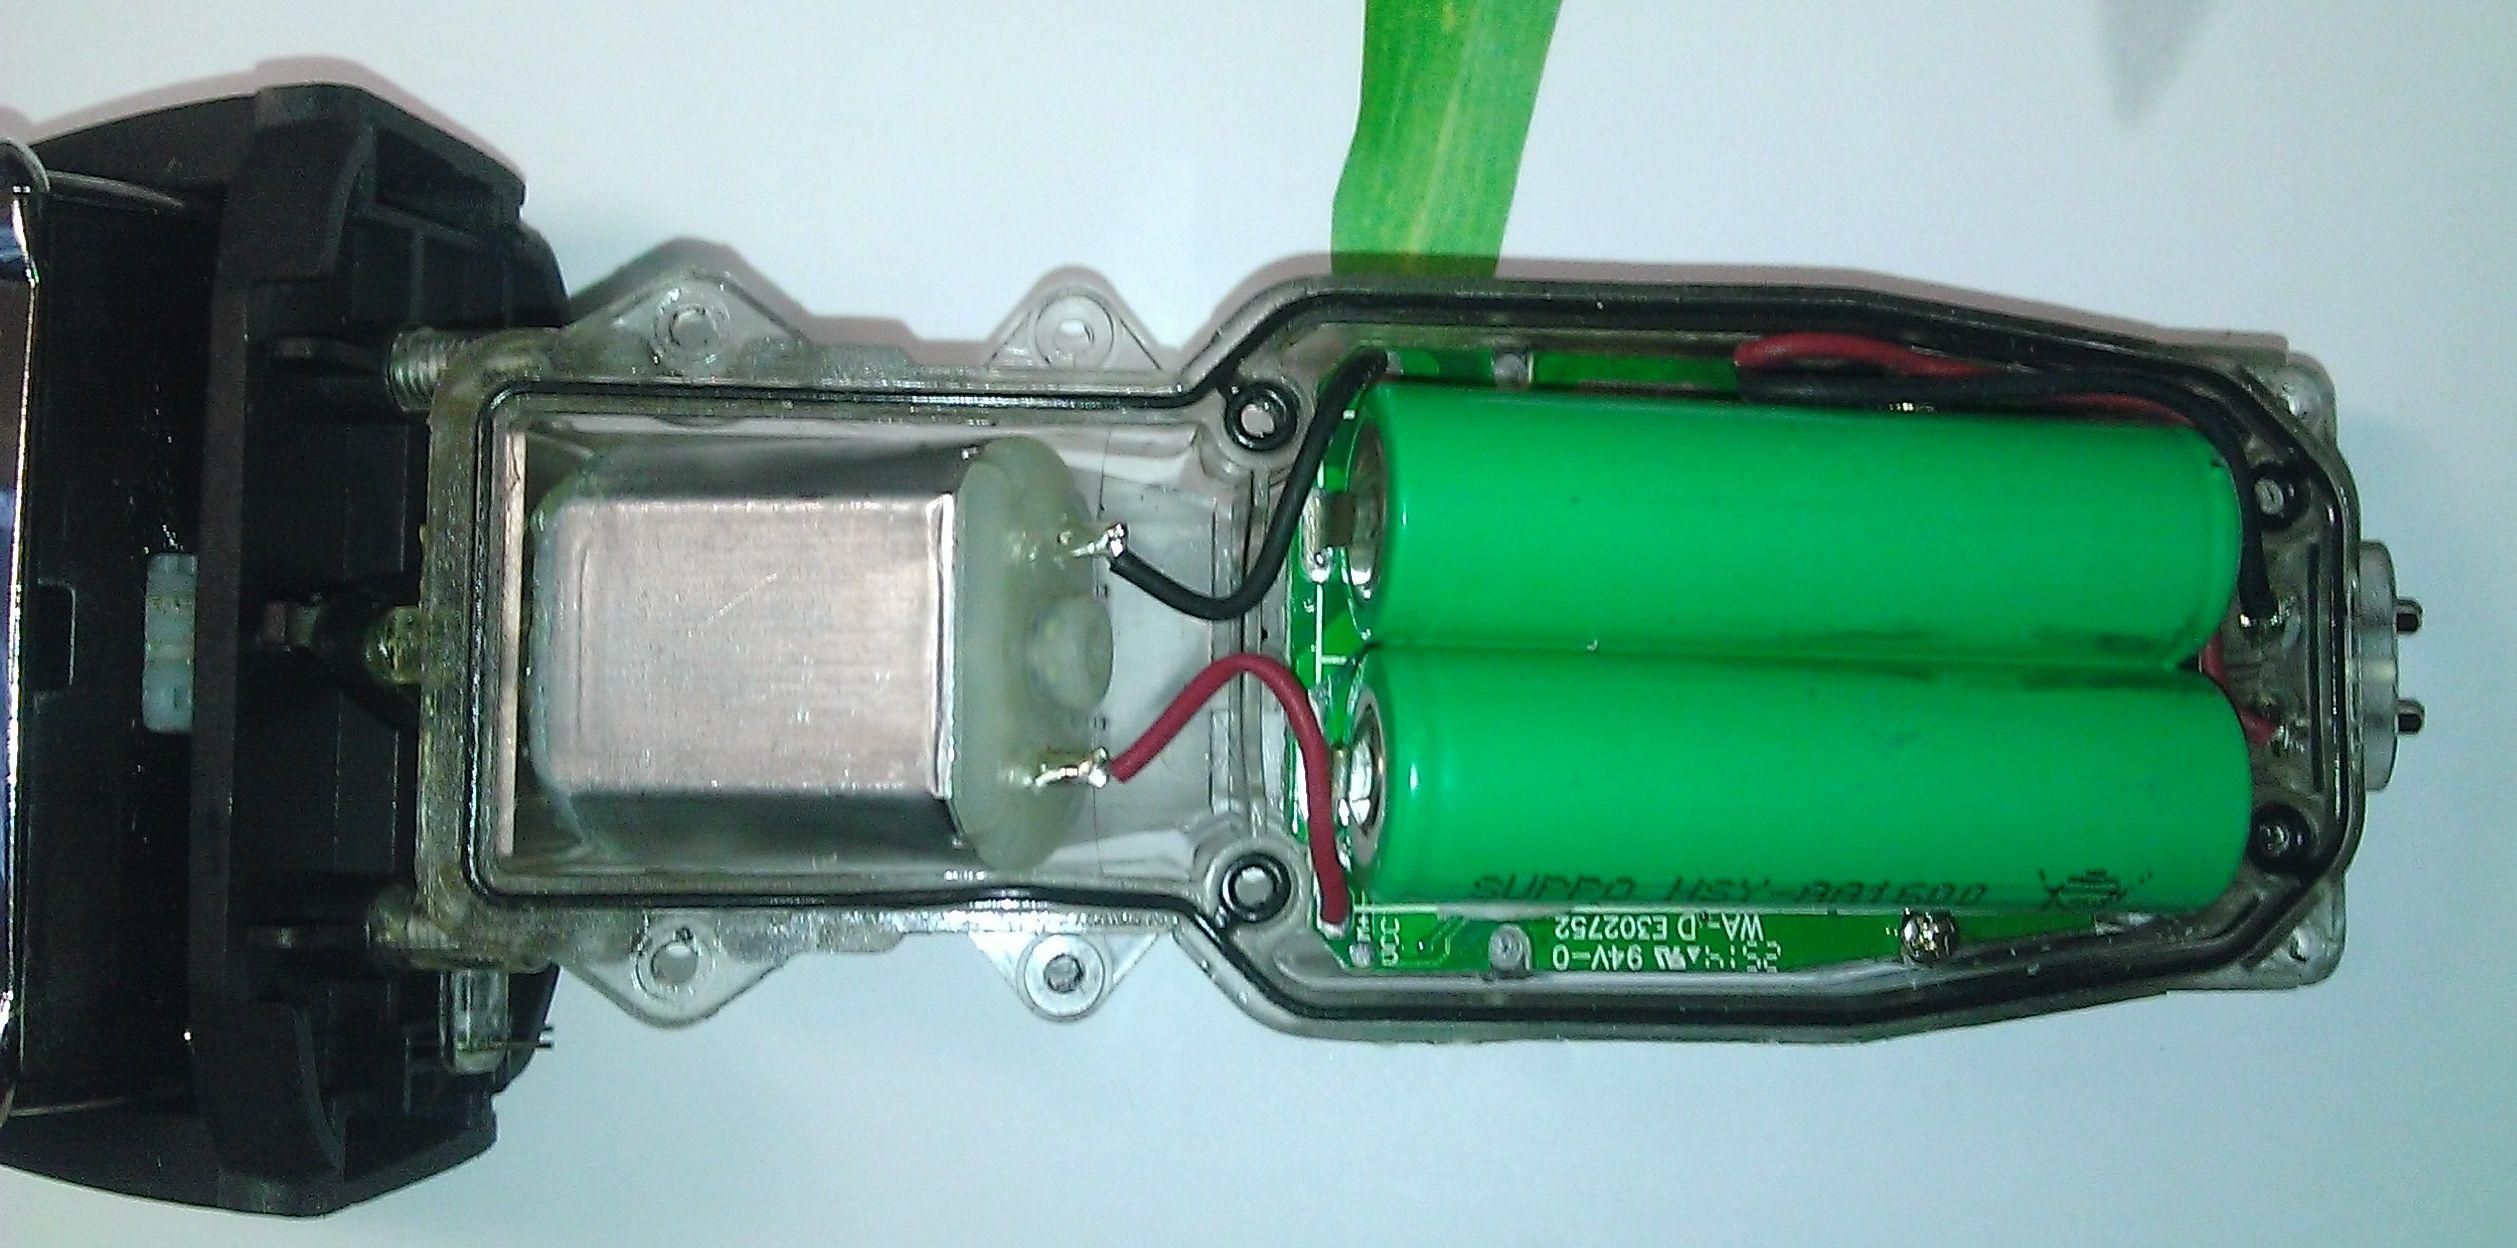 Аккумуляторная электробритва Remington со снятой крышкой